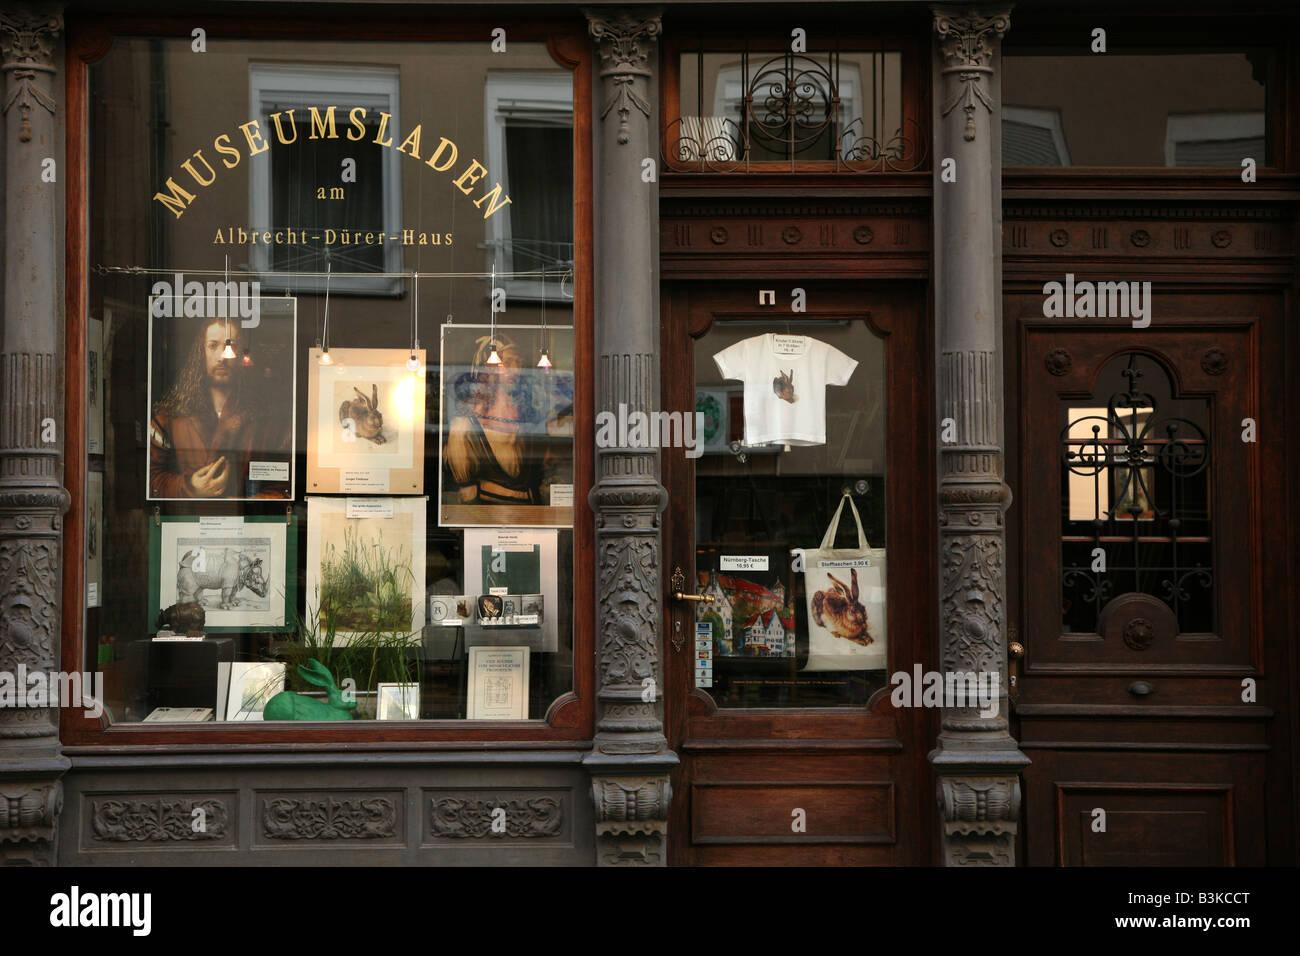 Souvenir-Shop vor dem Haus des berühmten deutschen Malers Albrecht Dürer in Nürnberg. Deutschland Stockbild